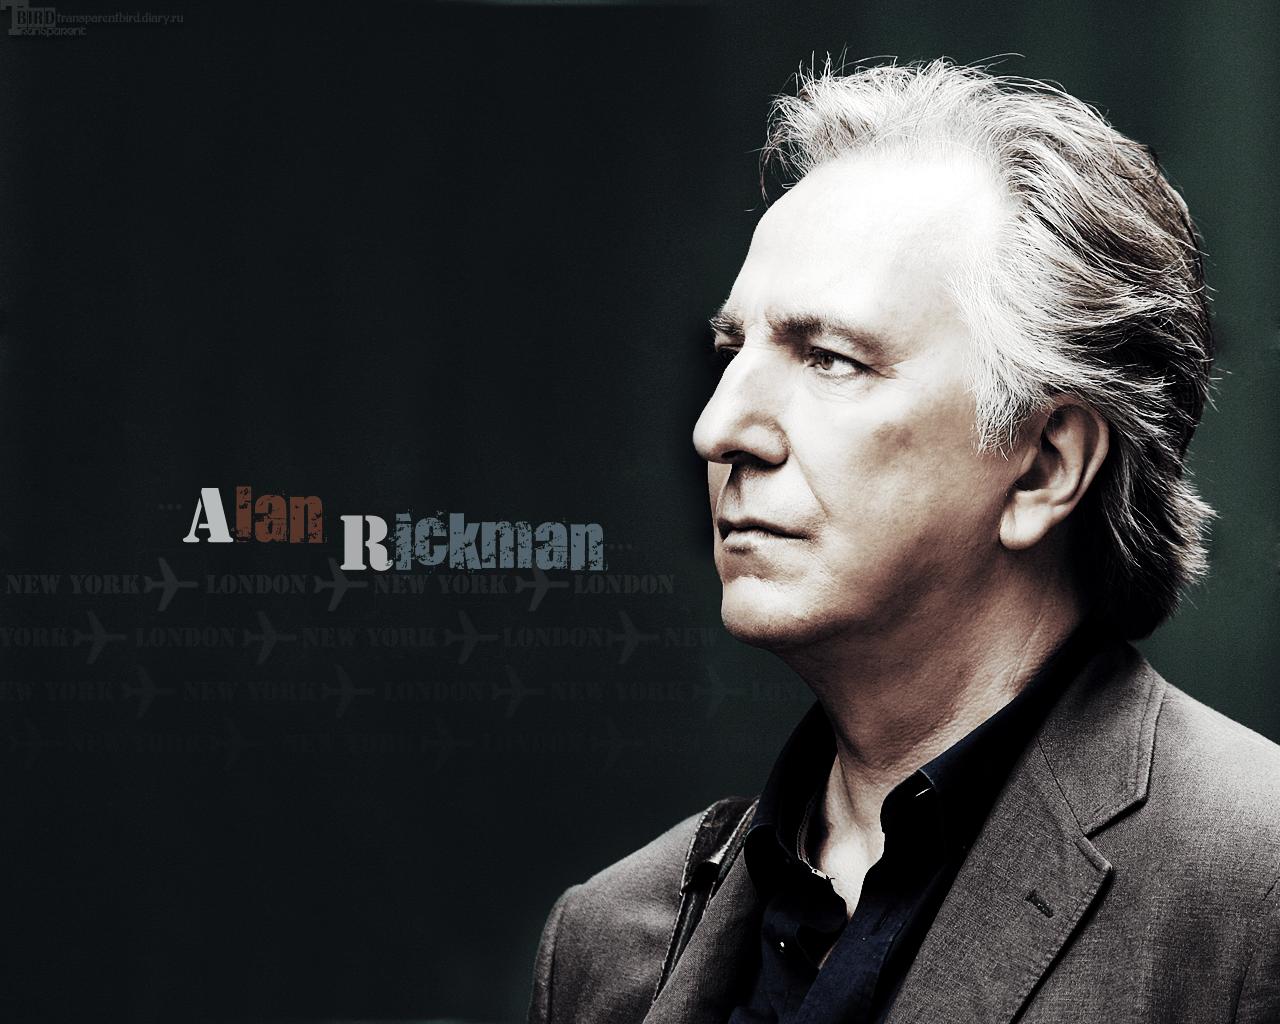 Alan Rickman - Alan Rickman Wallpaper (12842245) - Fanpop